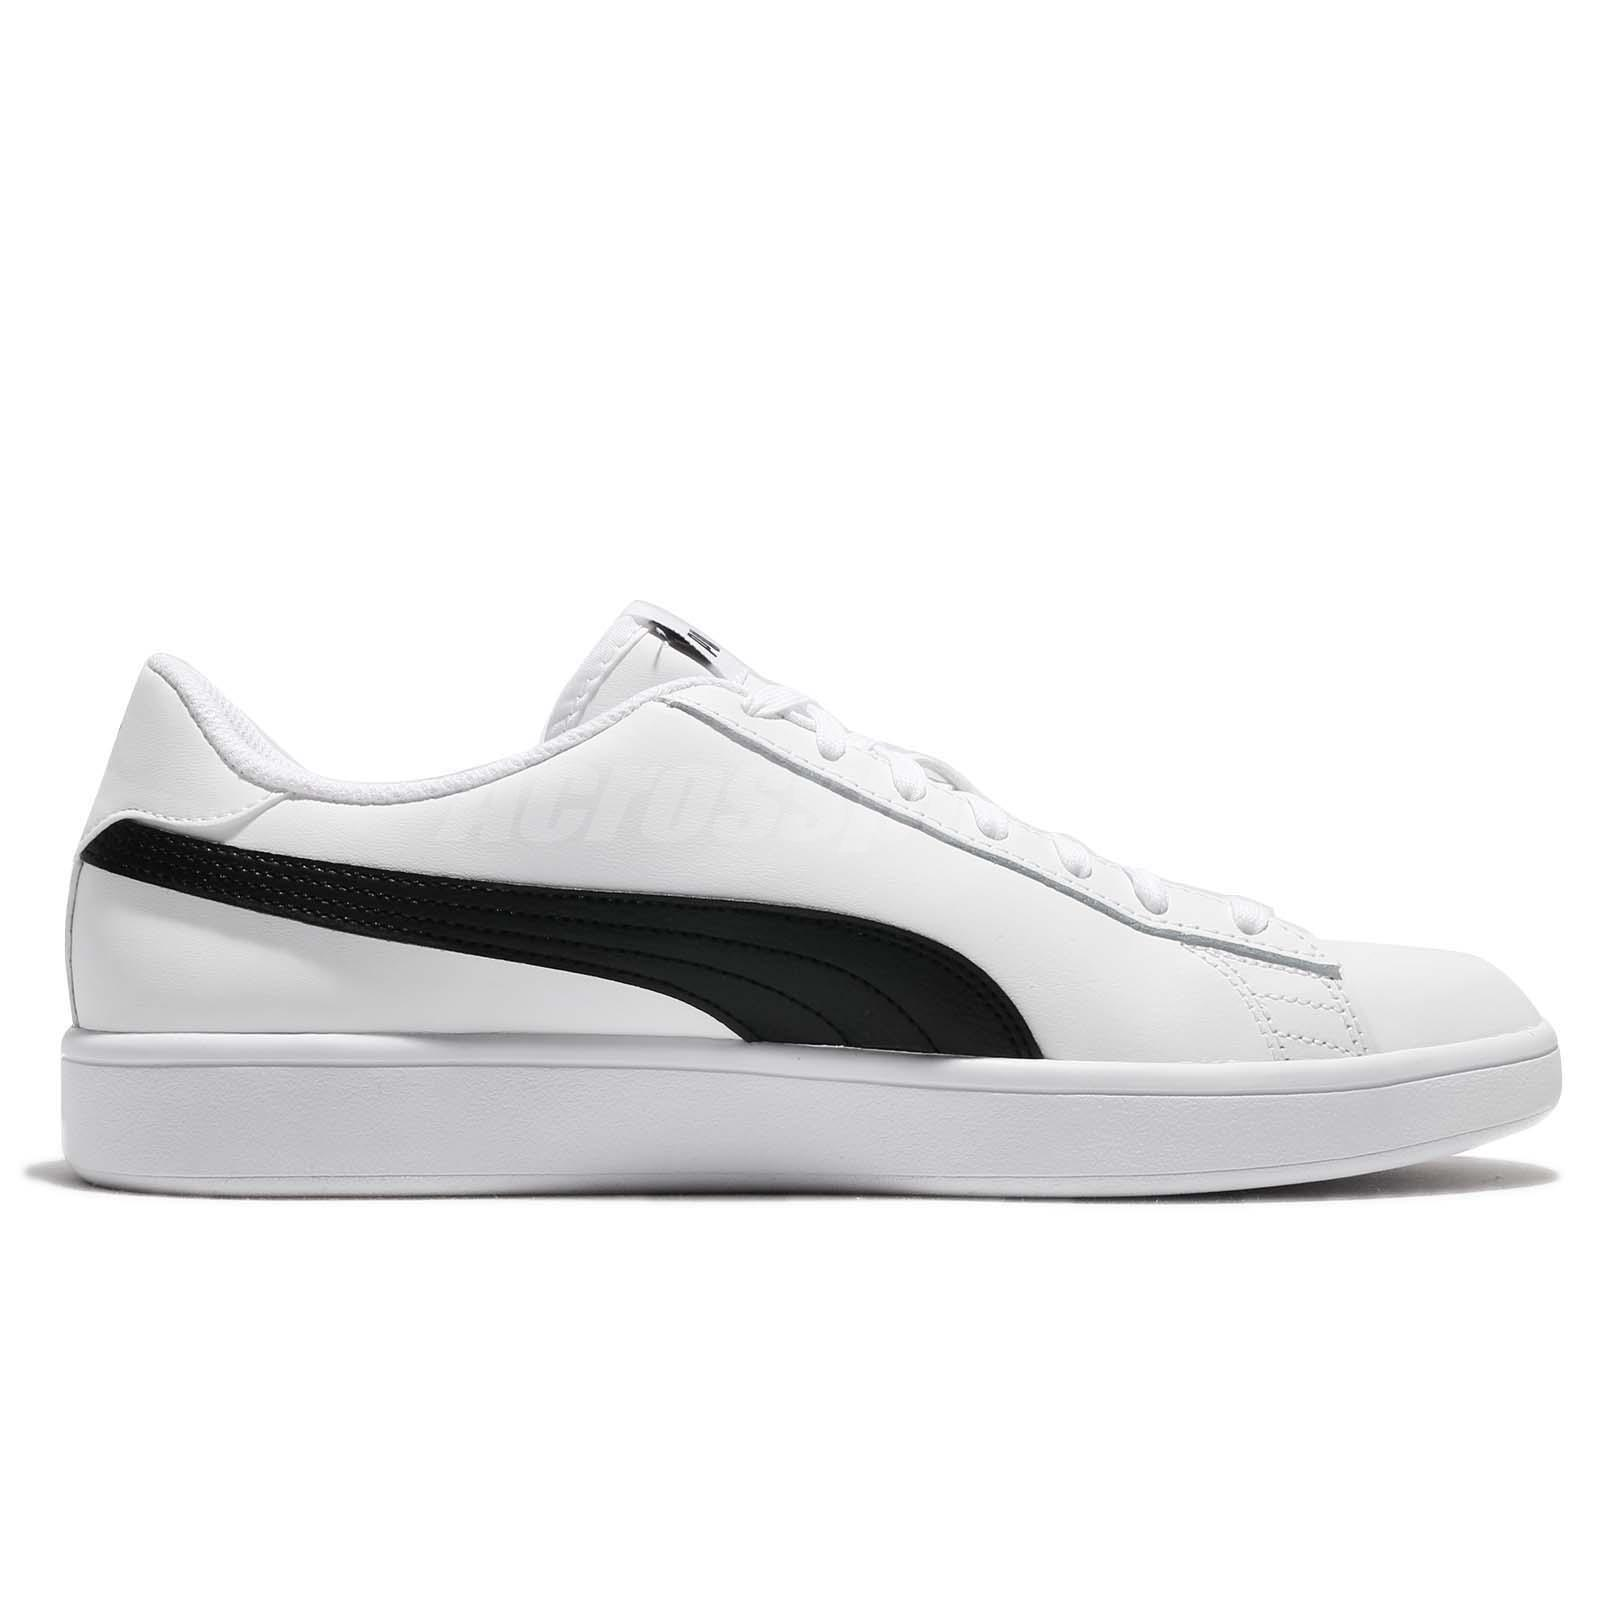 33dee8752 Puma Smash V2 L White Black Classic Men Shoes Sneakers Trainers ...